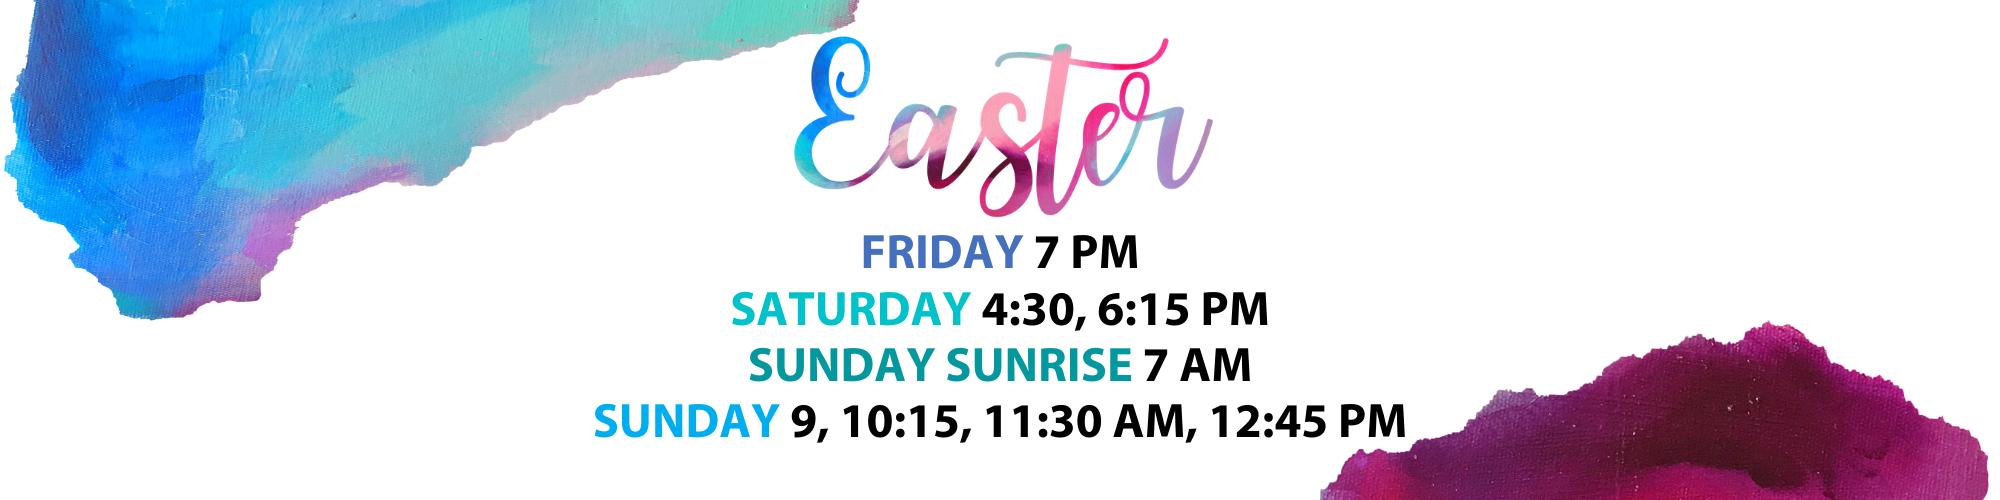 Easter-services-coastal-community-church-parkland-broward-christian-florida